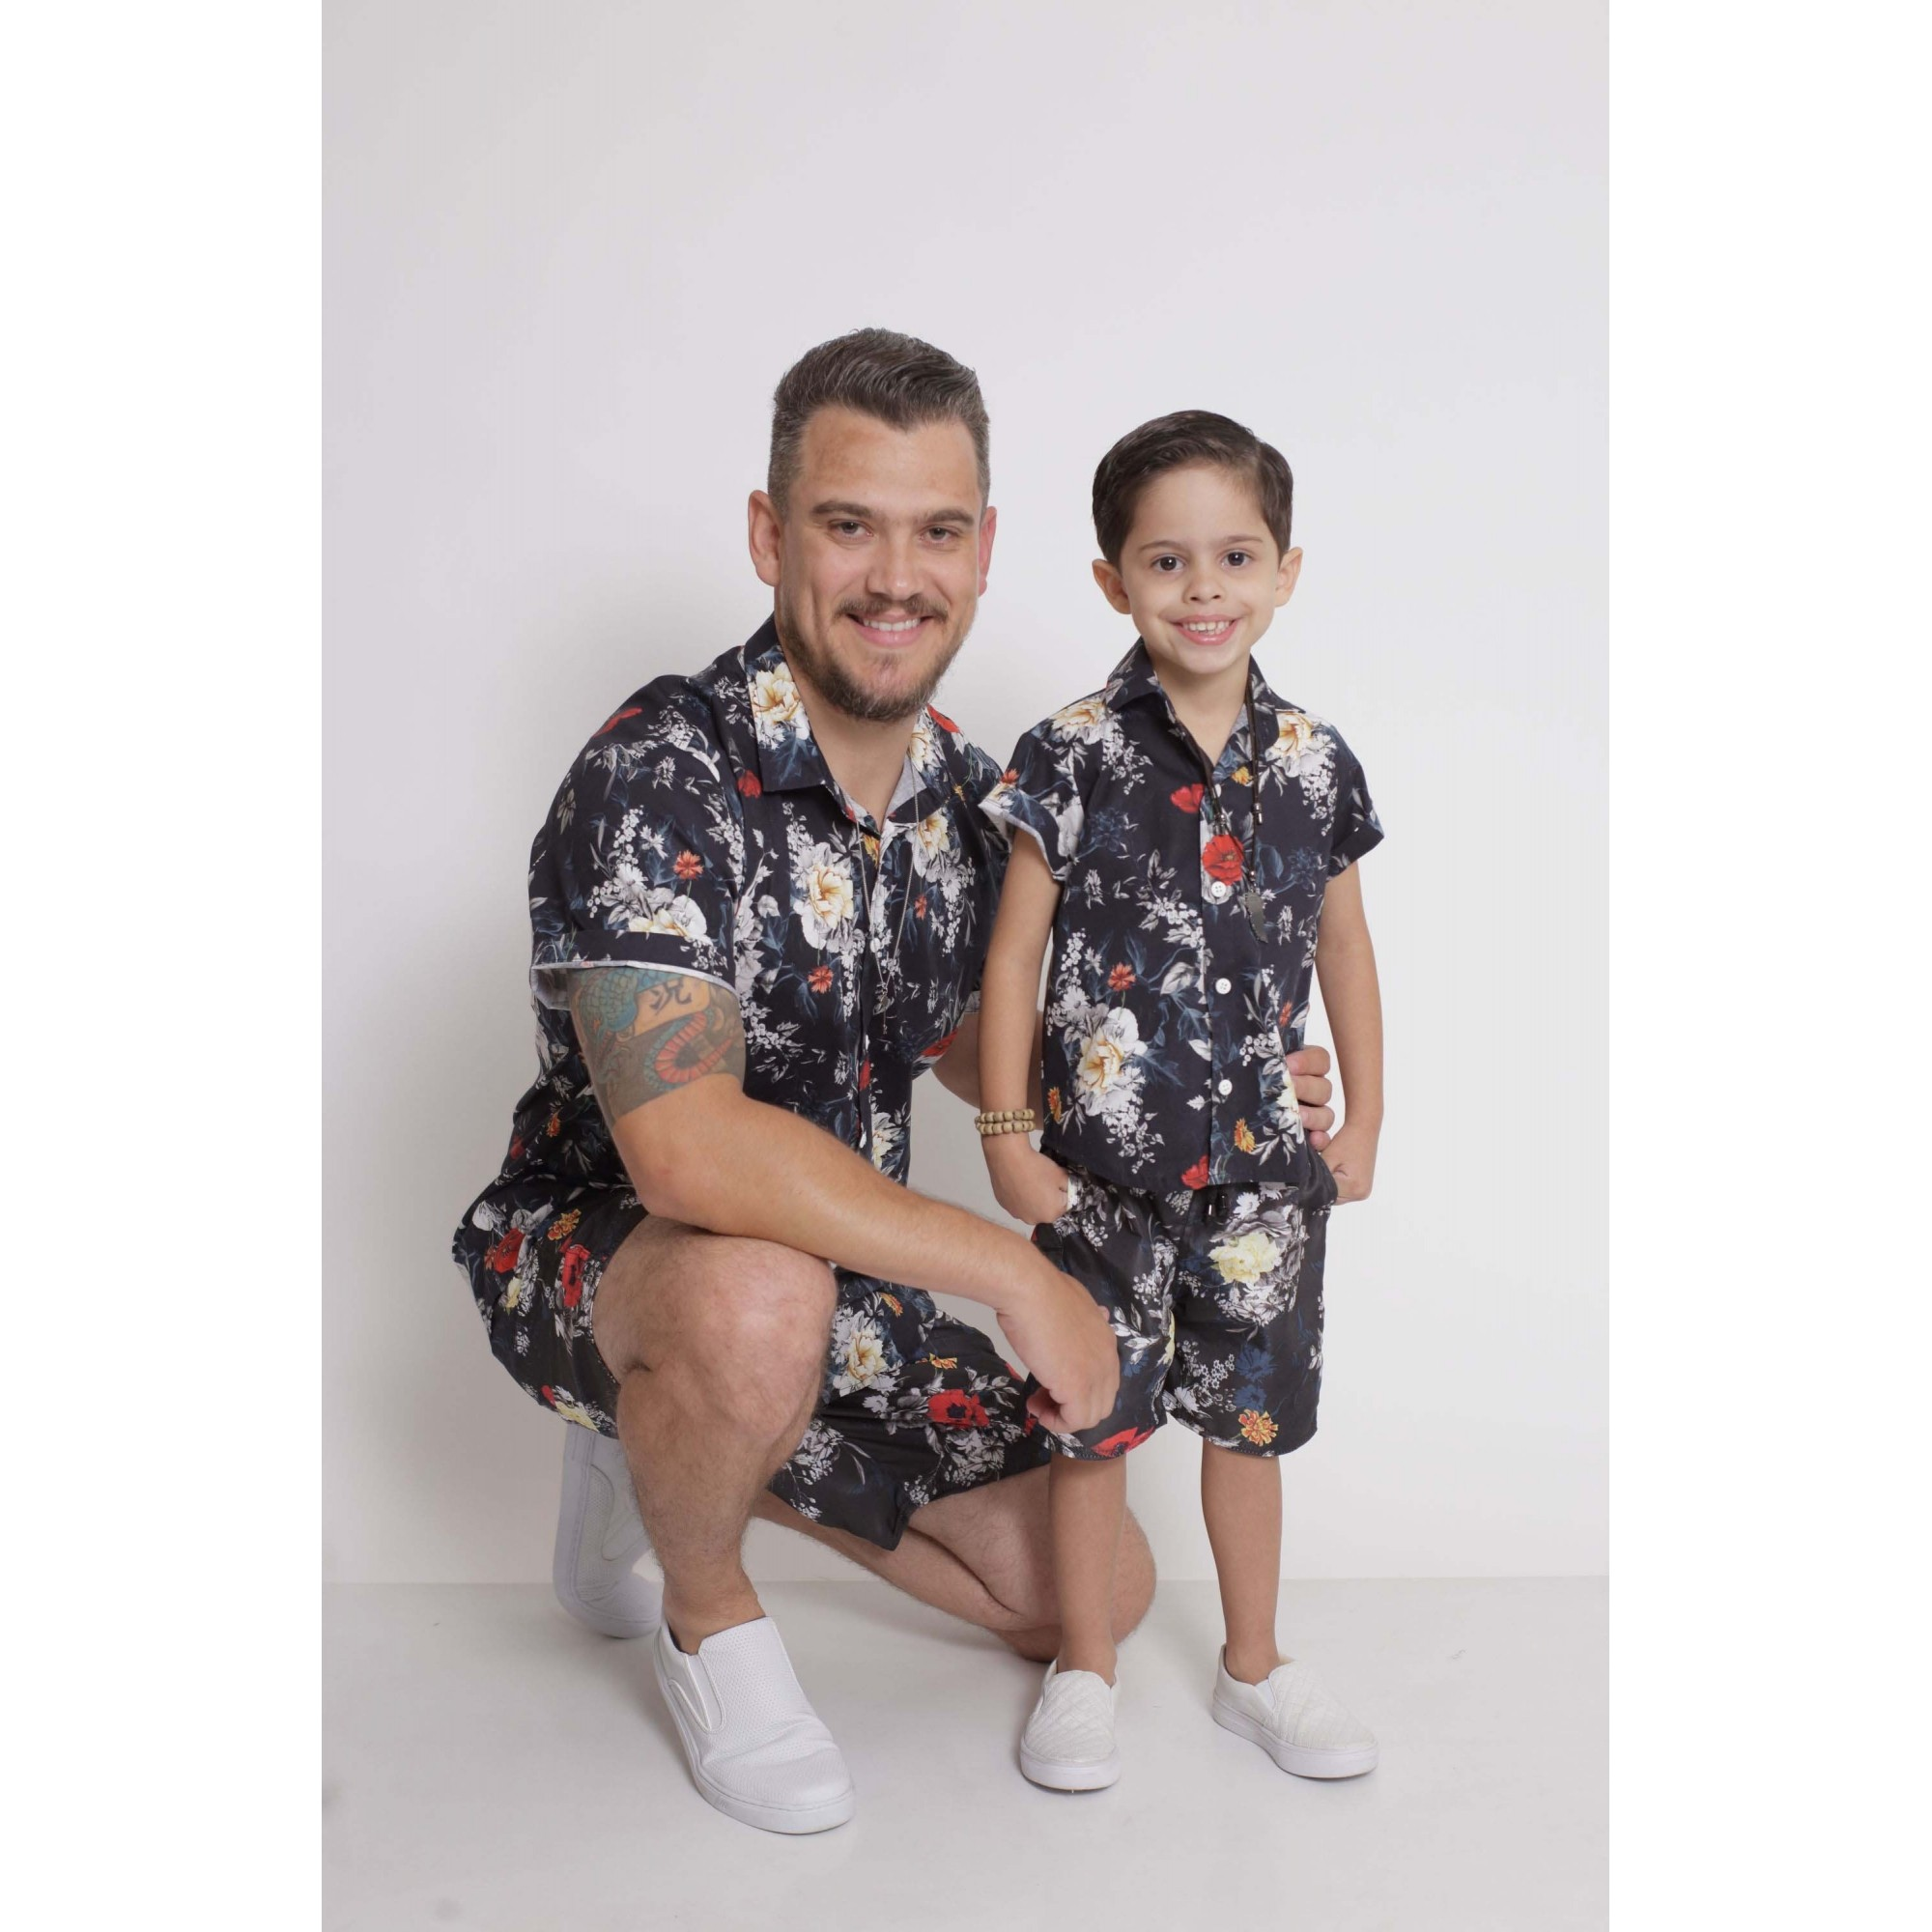 PAI E FILHO > Kit 02 Camisas Manga Curta Preta Floral  [Coleção Tal Pai Tal Filho]  - Heitor Fashion Brazil